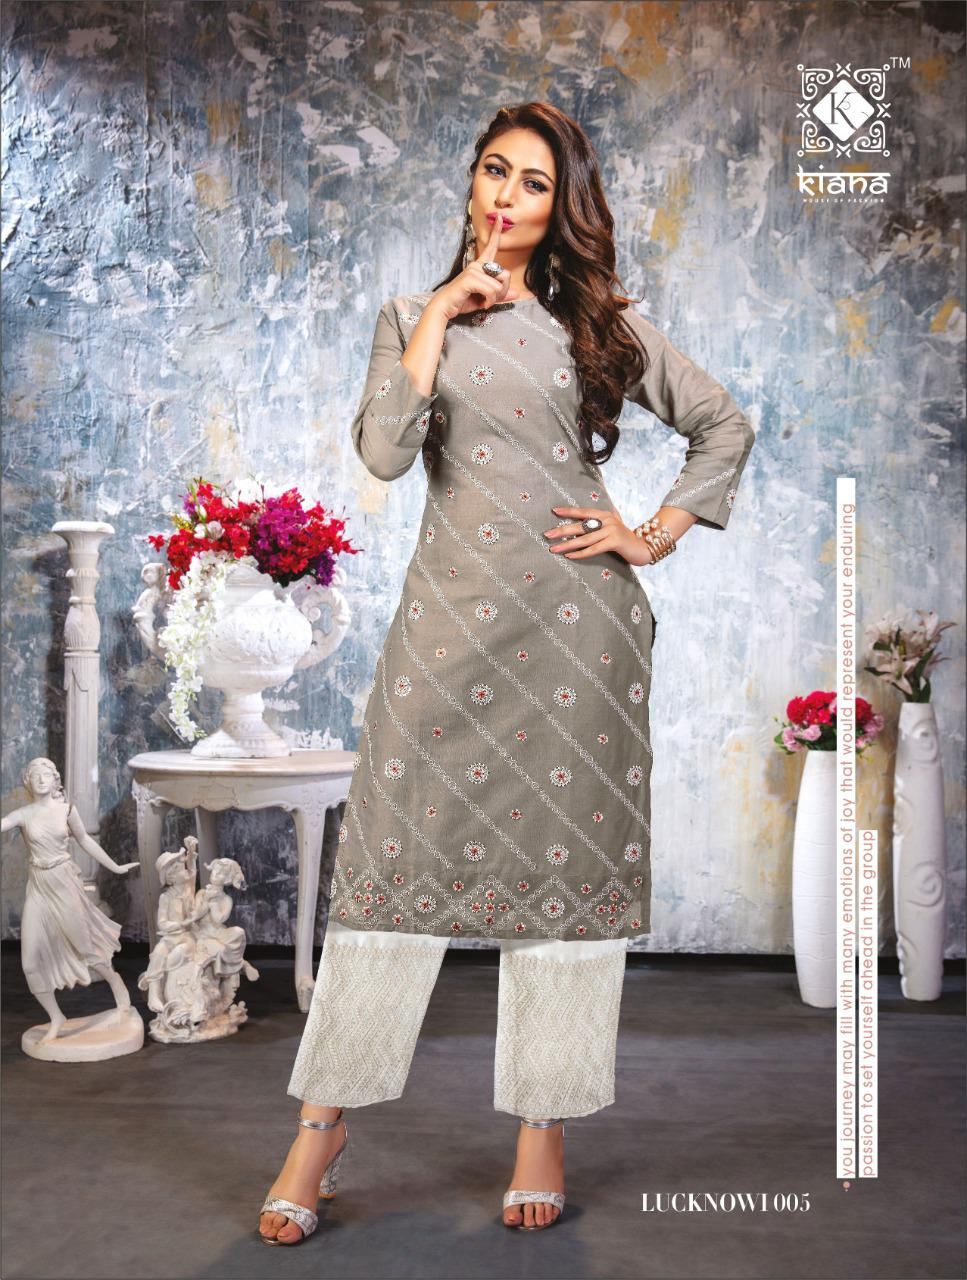 Kiana Lucknowi Kurti with Pant Wholesale Catalog 6 Pcs 23 - Kiana Lucknowi Kurti with Pant Wholesale Catalog 6 Pcs